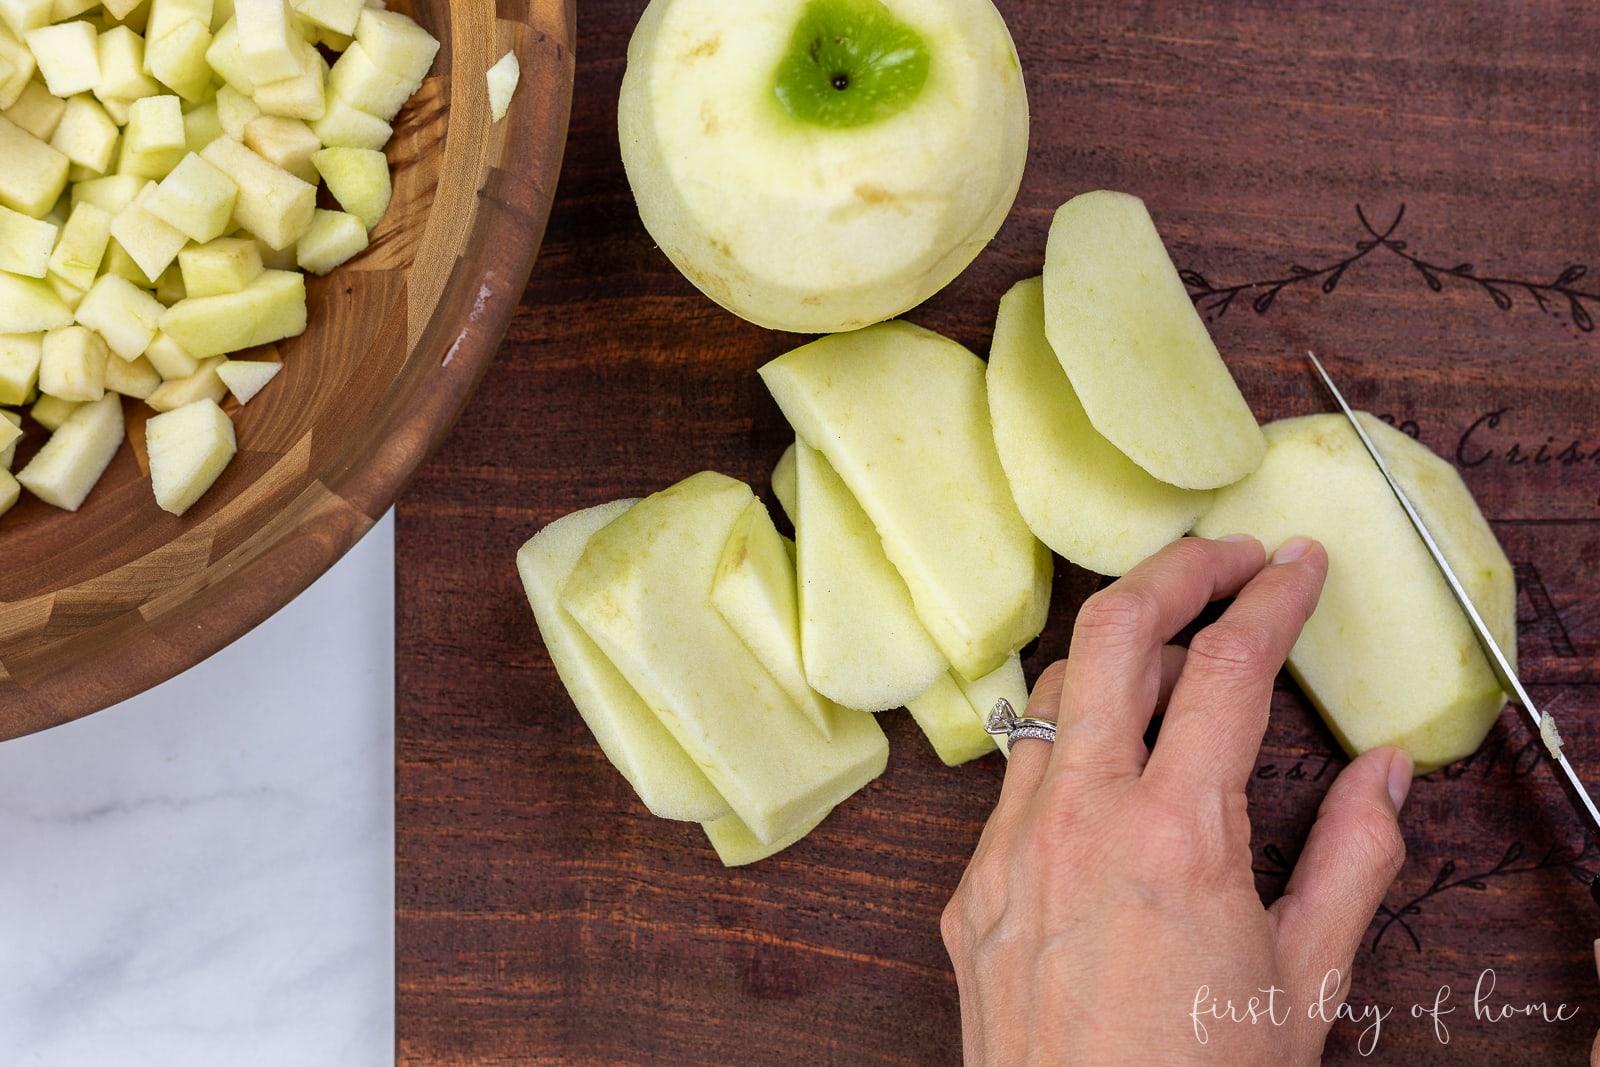 Slicing Granny Smith apples for apple empanada recipe